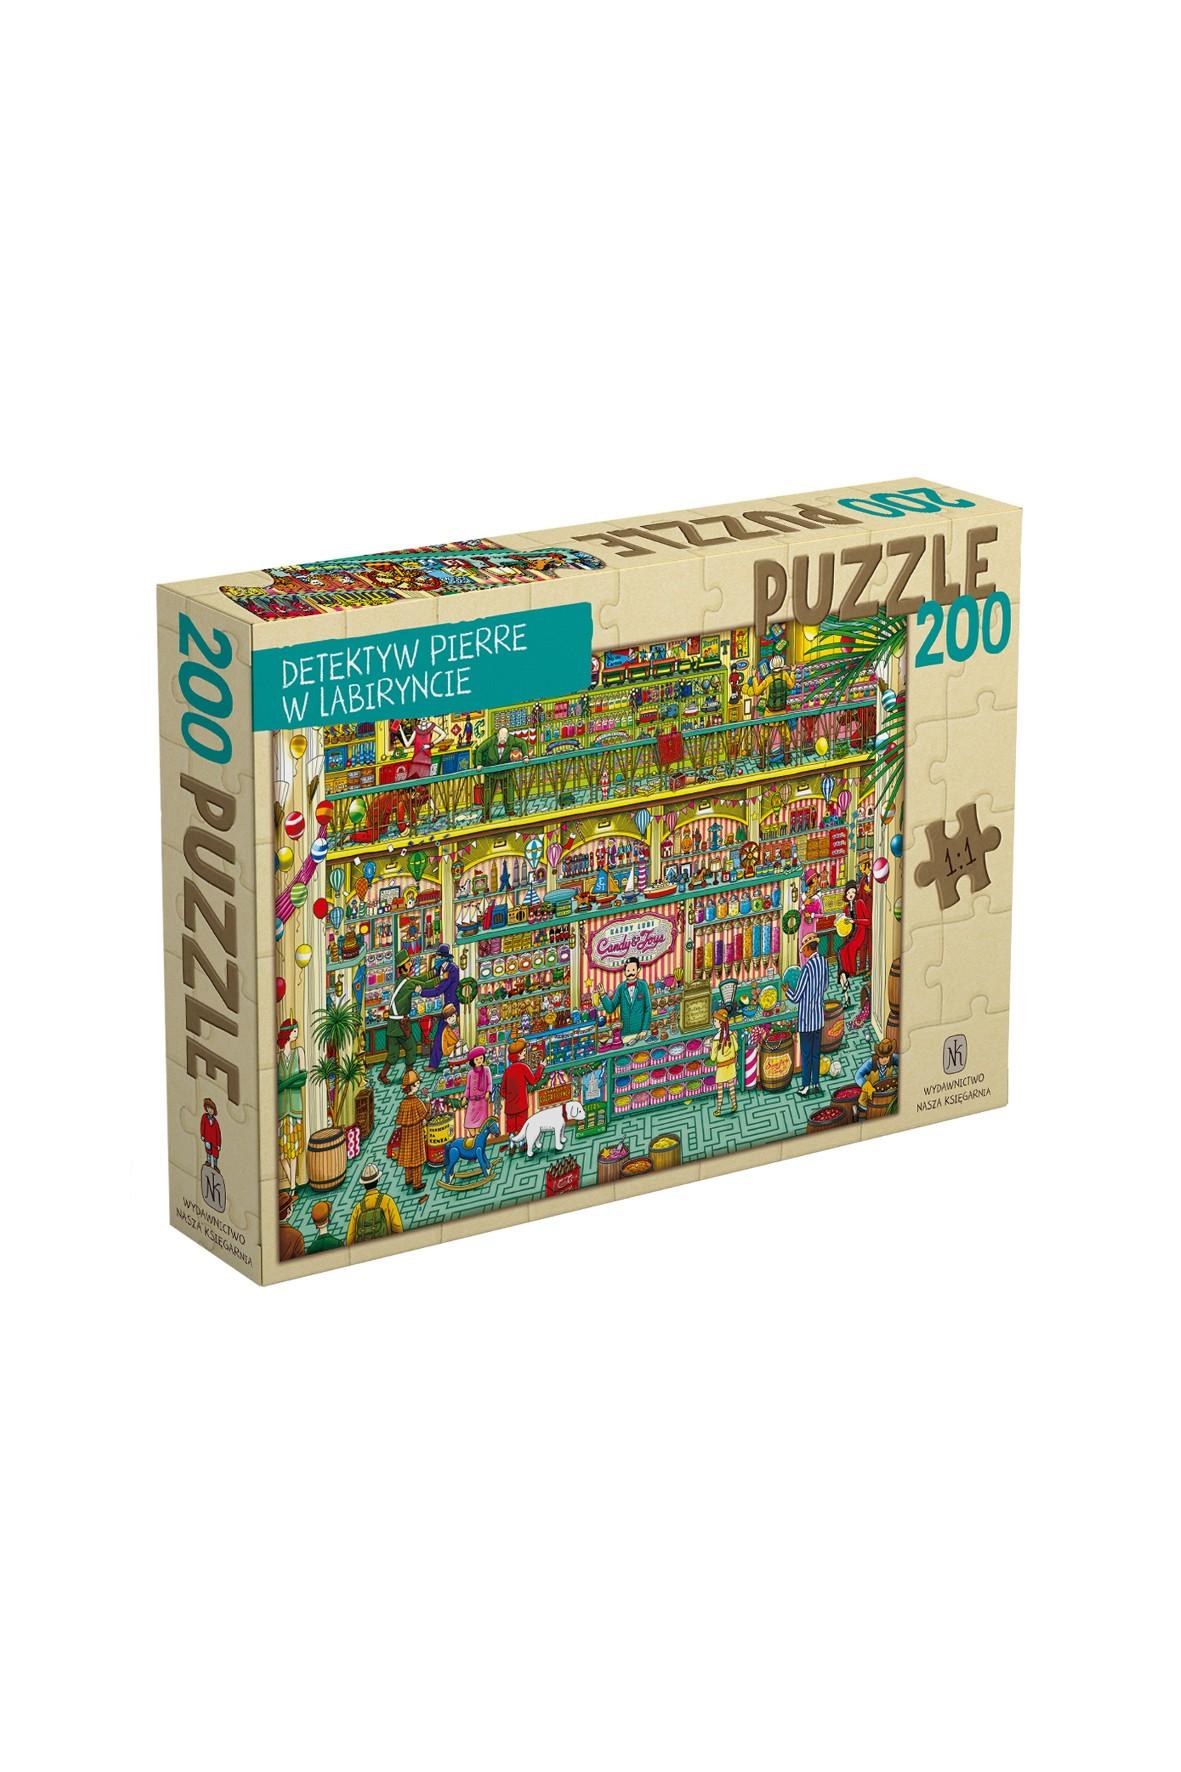 Puzzle Detektyw Pierre w labiryncie- 200el